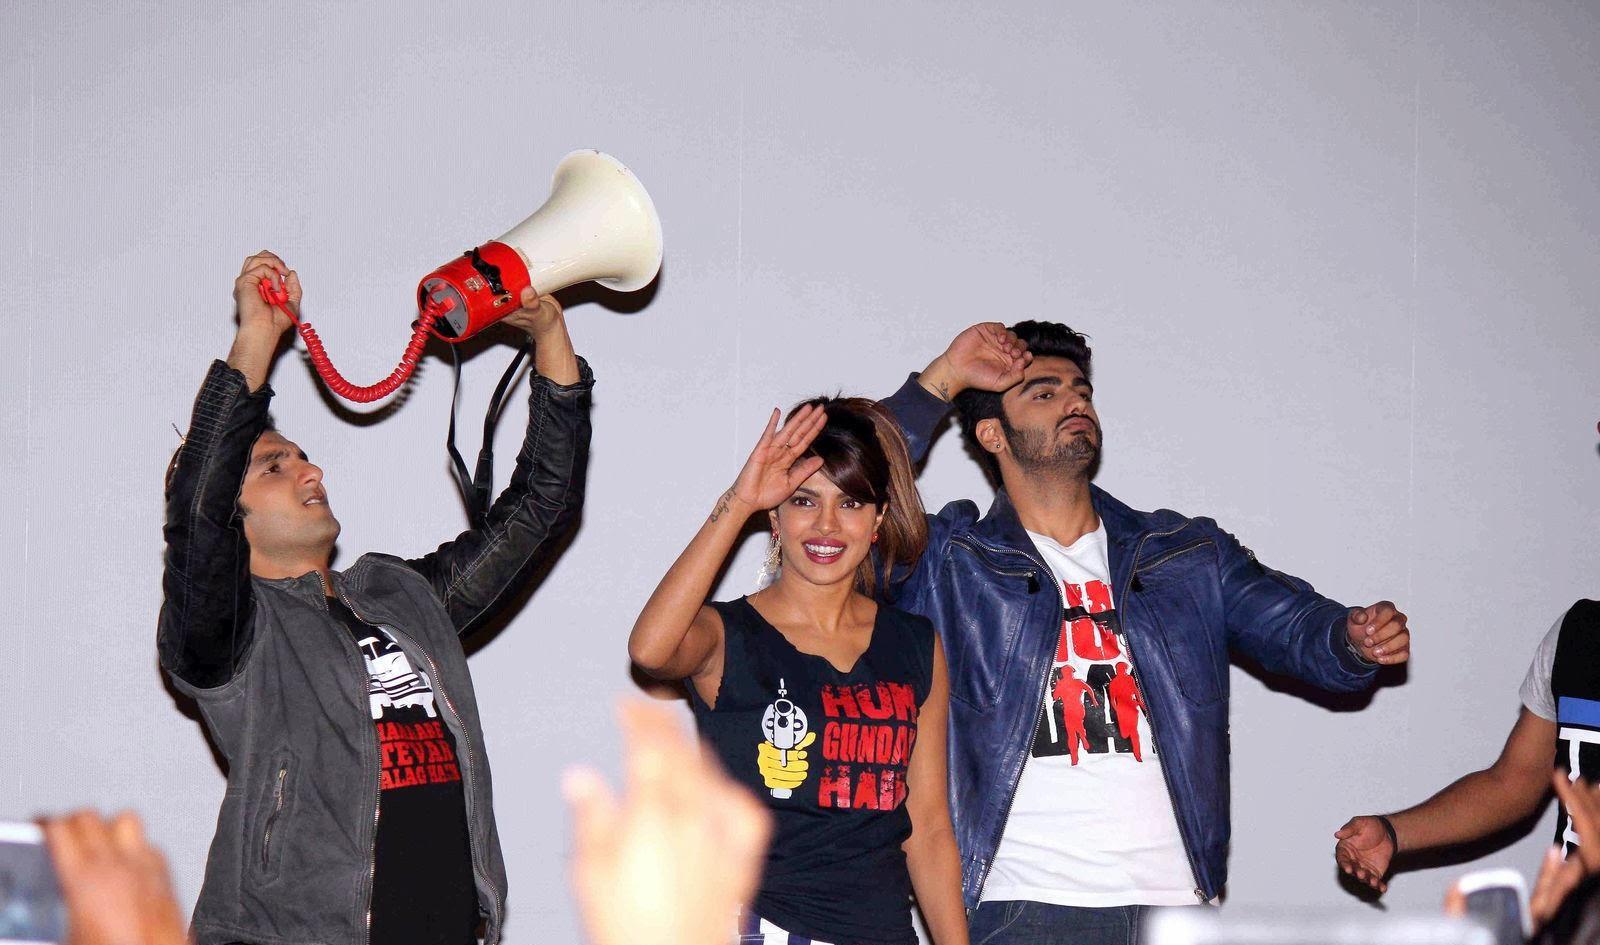 http://3.bp.blogspot.com/-fJccTzx1Iyw/Uv8p8hz4BeI/AAAAAAAAkzQ/tAAvirLC3oo/s1600/Gunday+Movie+Team+Visit+Gaiety+Galaxy+For+Movie+Promotions+%252812%2529.jpg